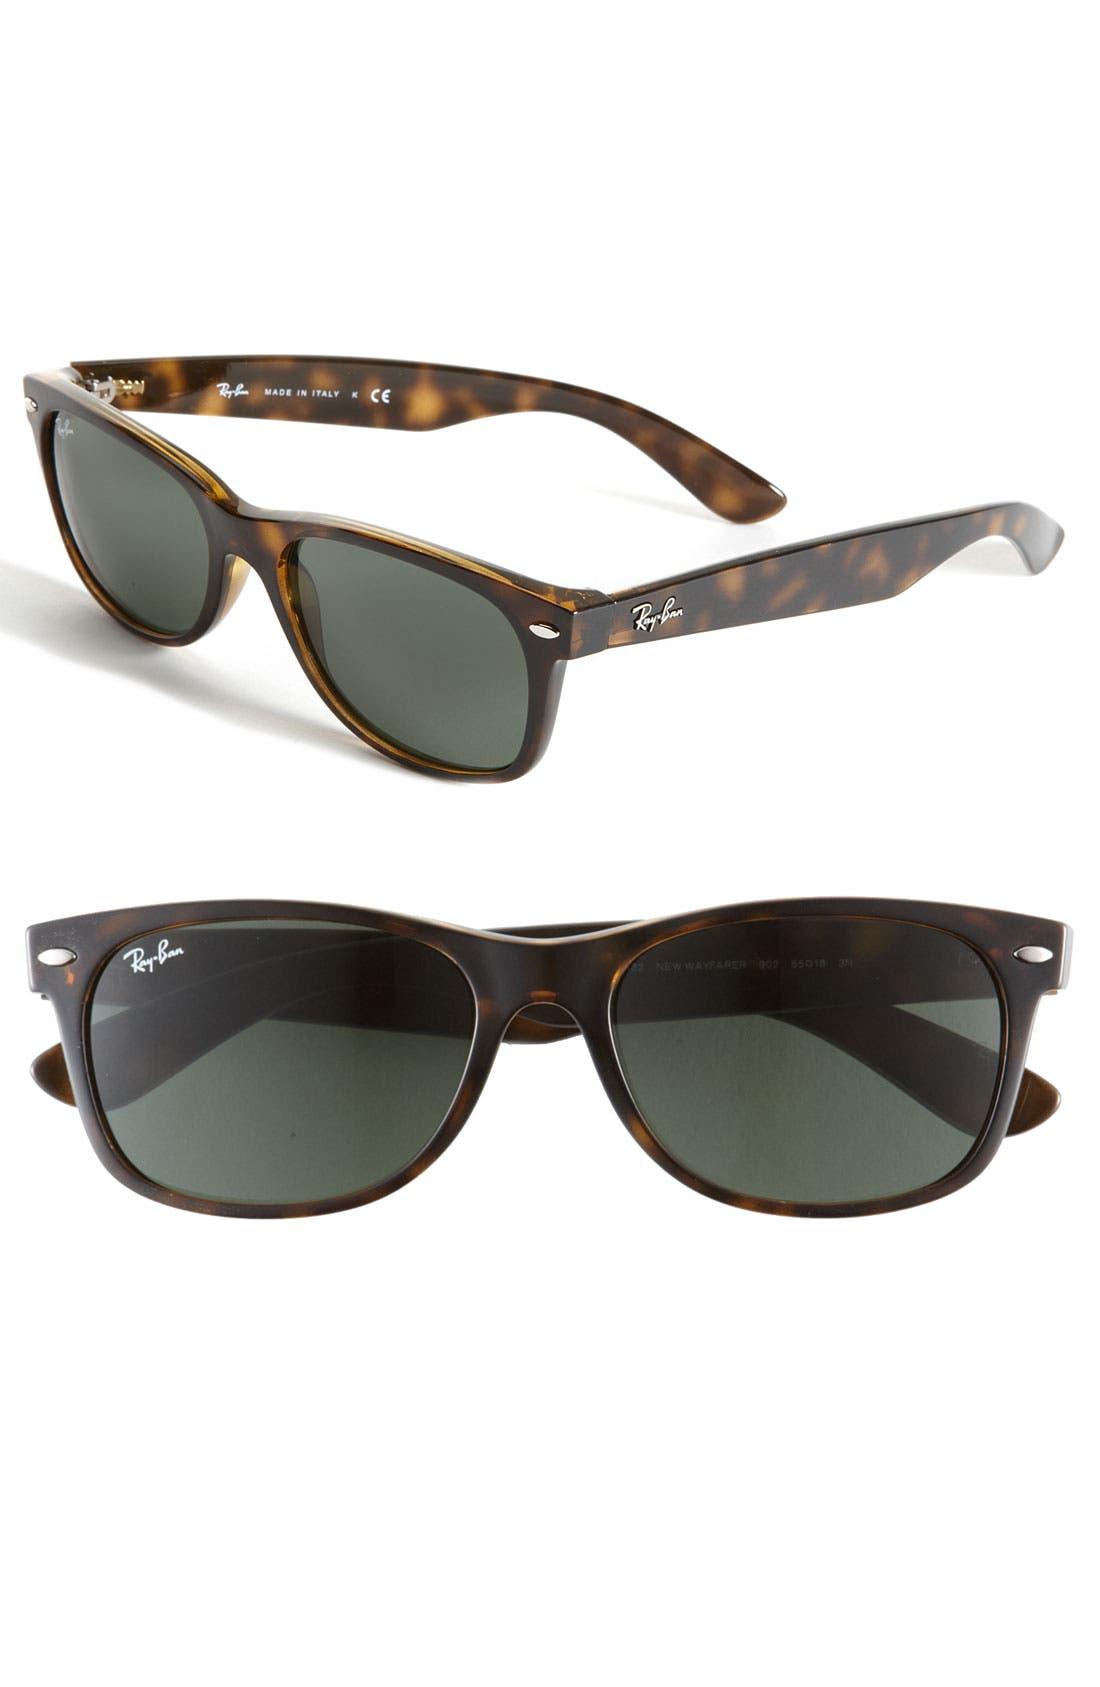 b696226a6bba8 Men s Sunglasses   Eyeglasses